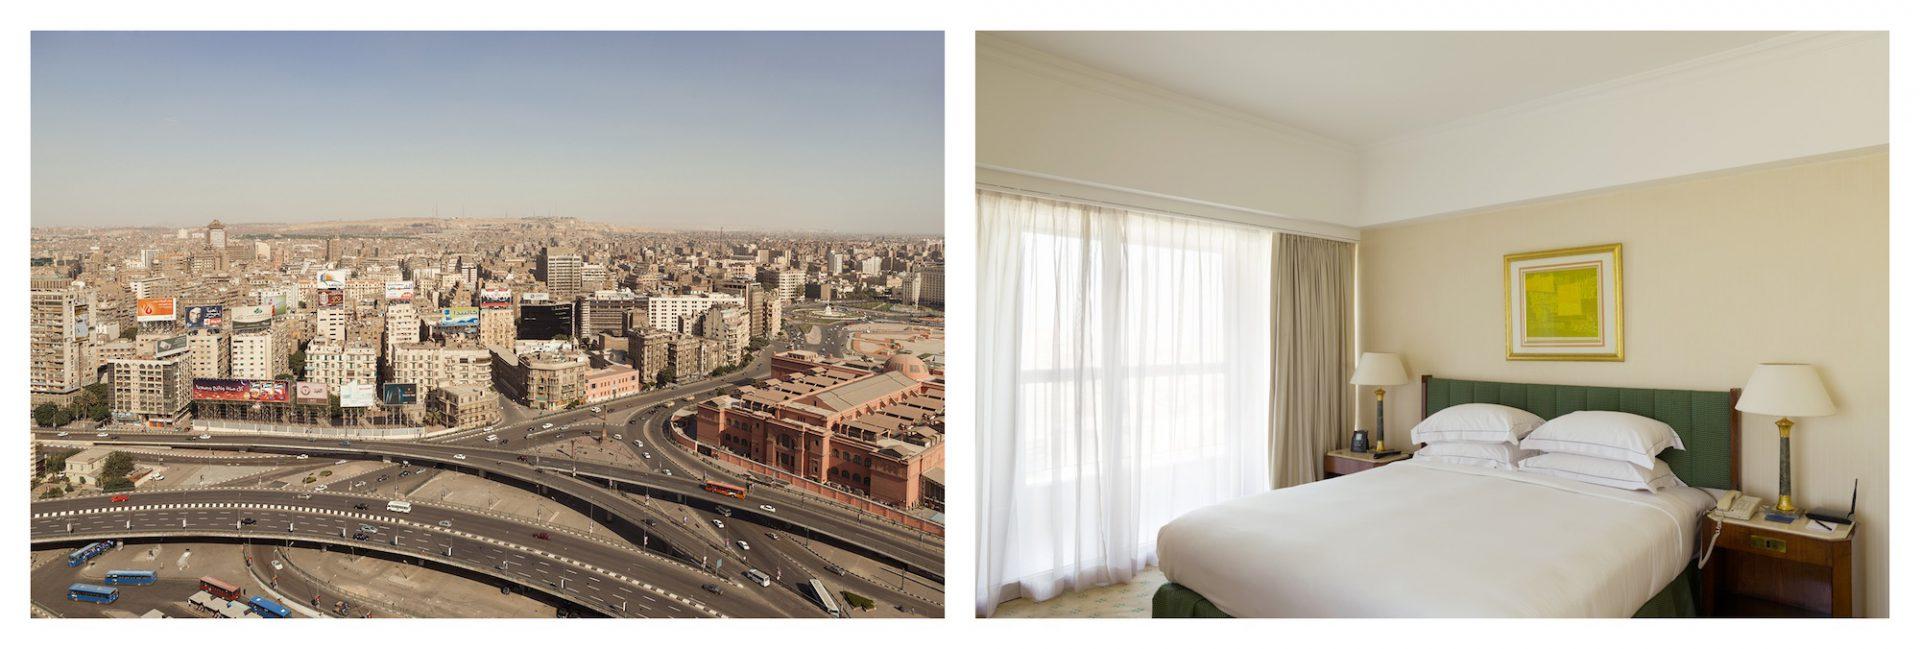 Seite 26-27. 26.06.2015, Cairo, Room 2605